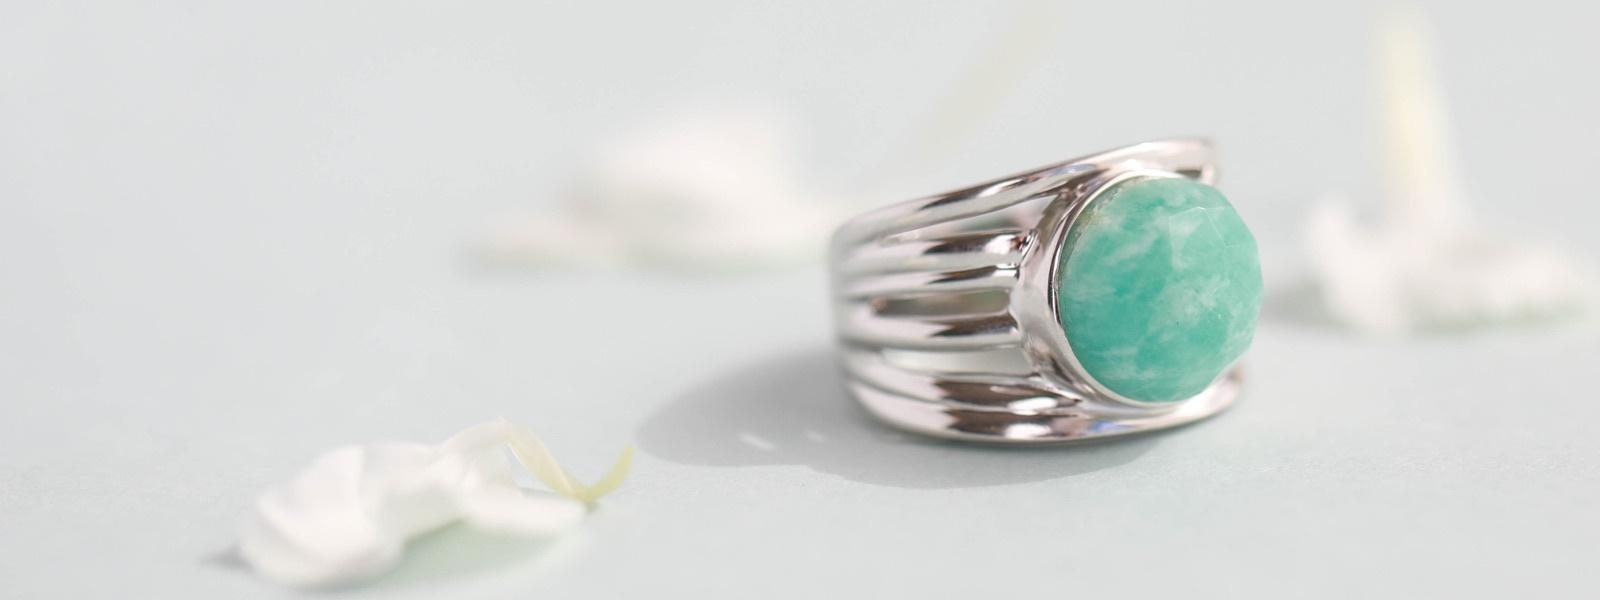 Clearance Jewelry